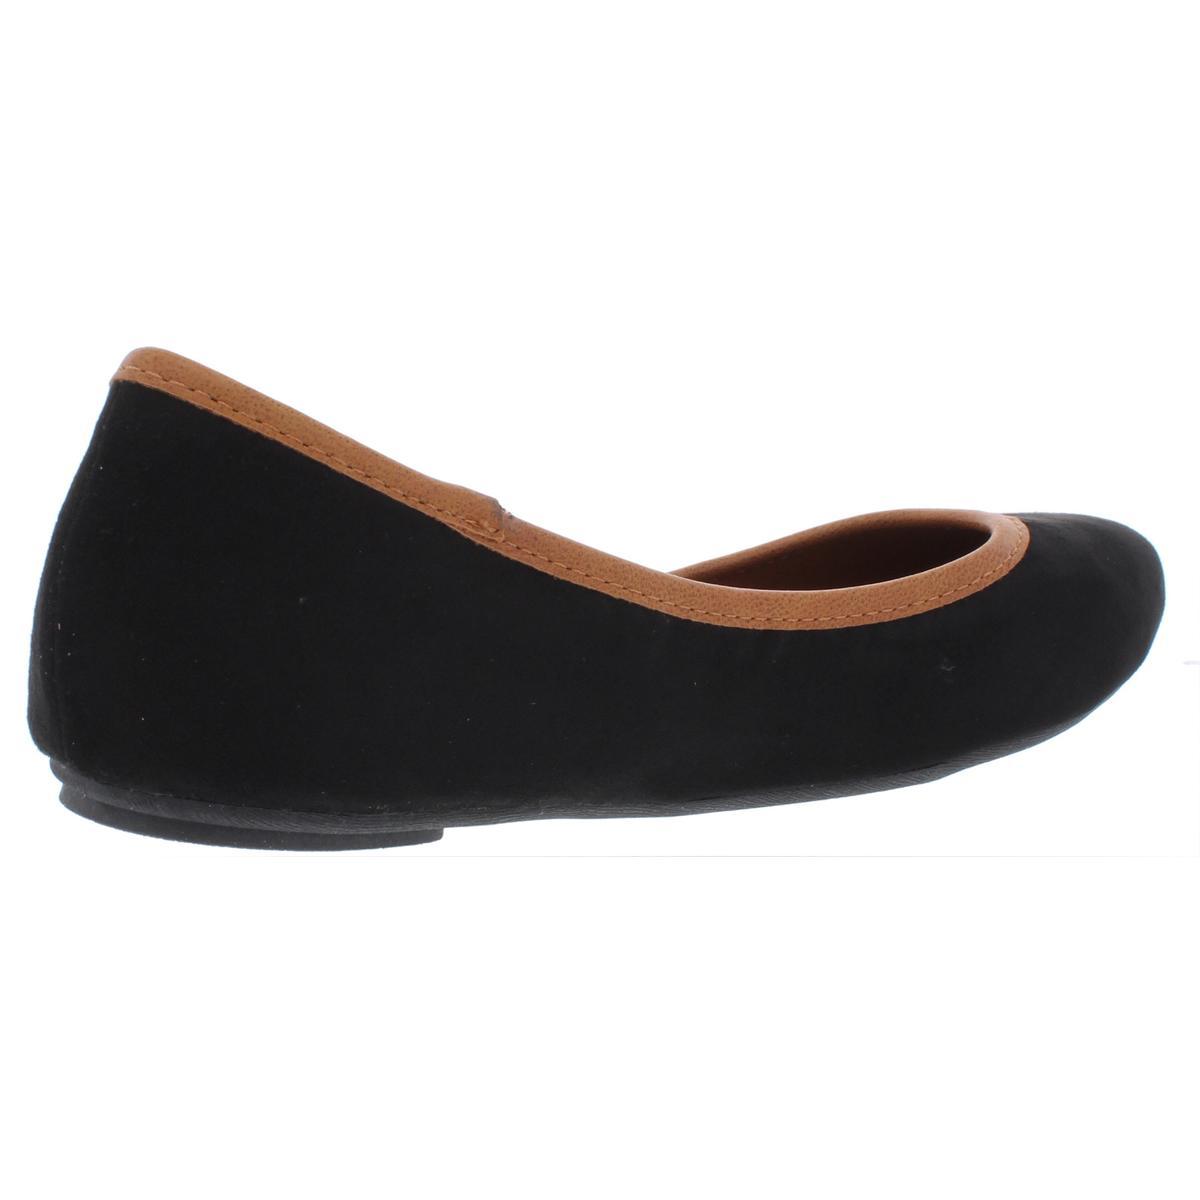 American-Rag-Womens-Cellia-Contrast-Trim-Slip-On-Ballet-Flats-Shoes-BHFO-6452 thumbnail 6